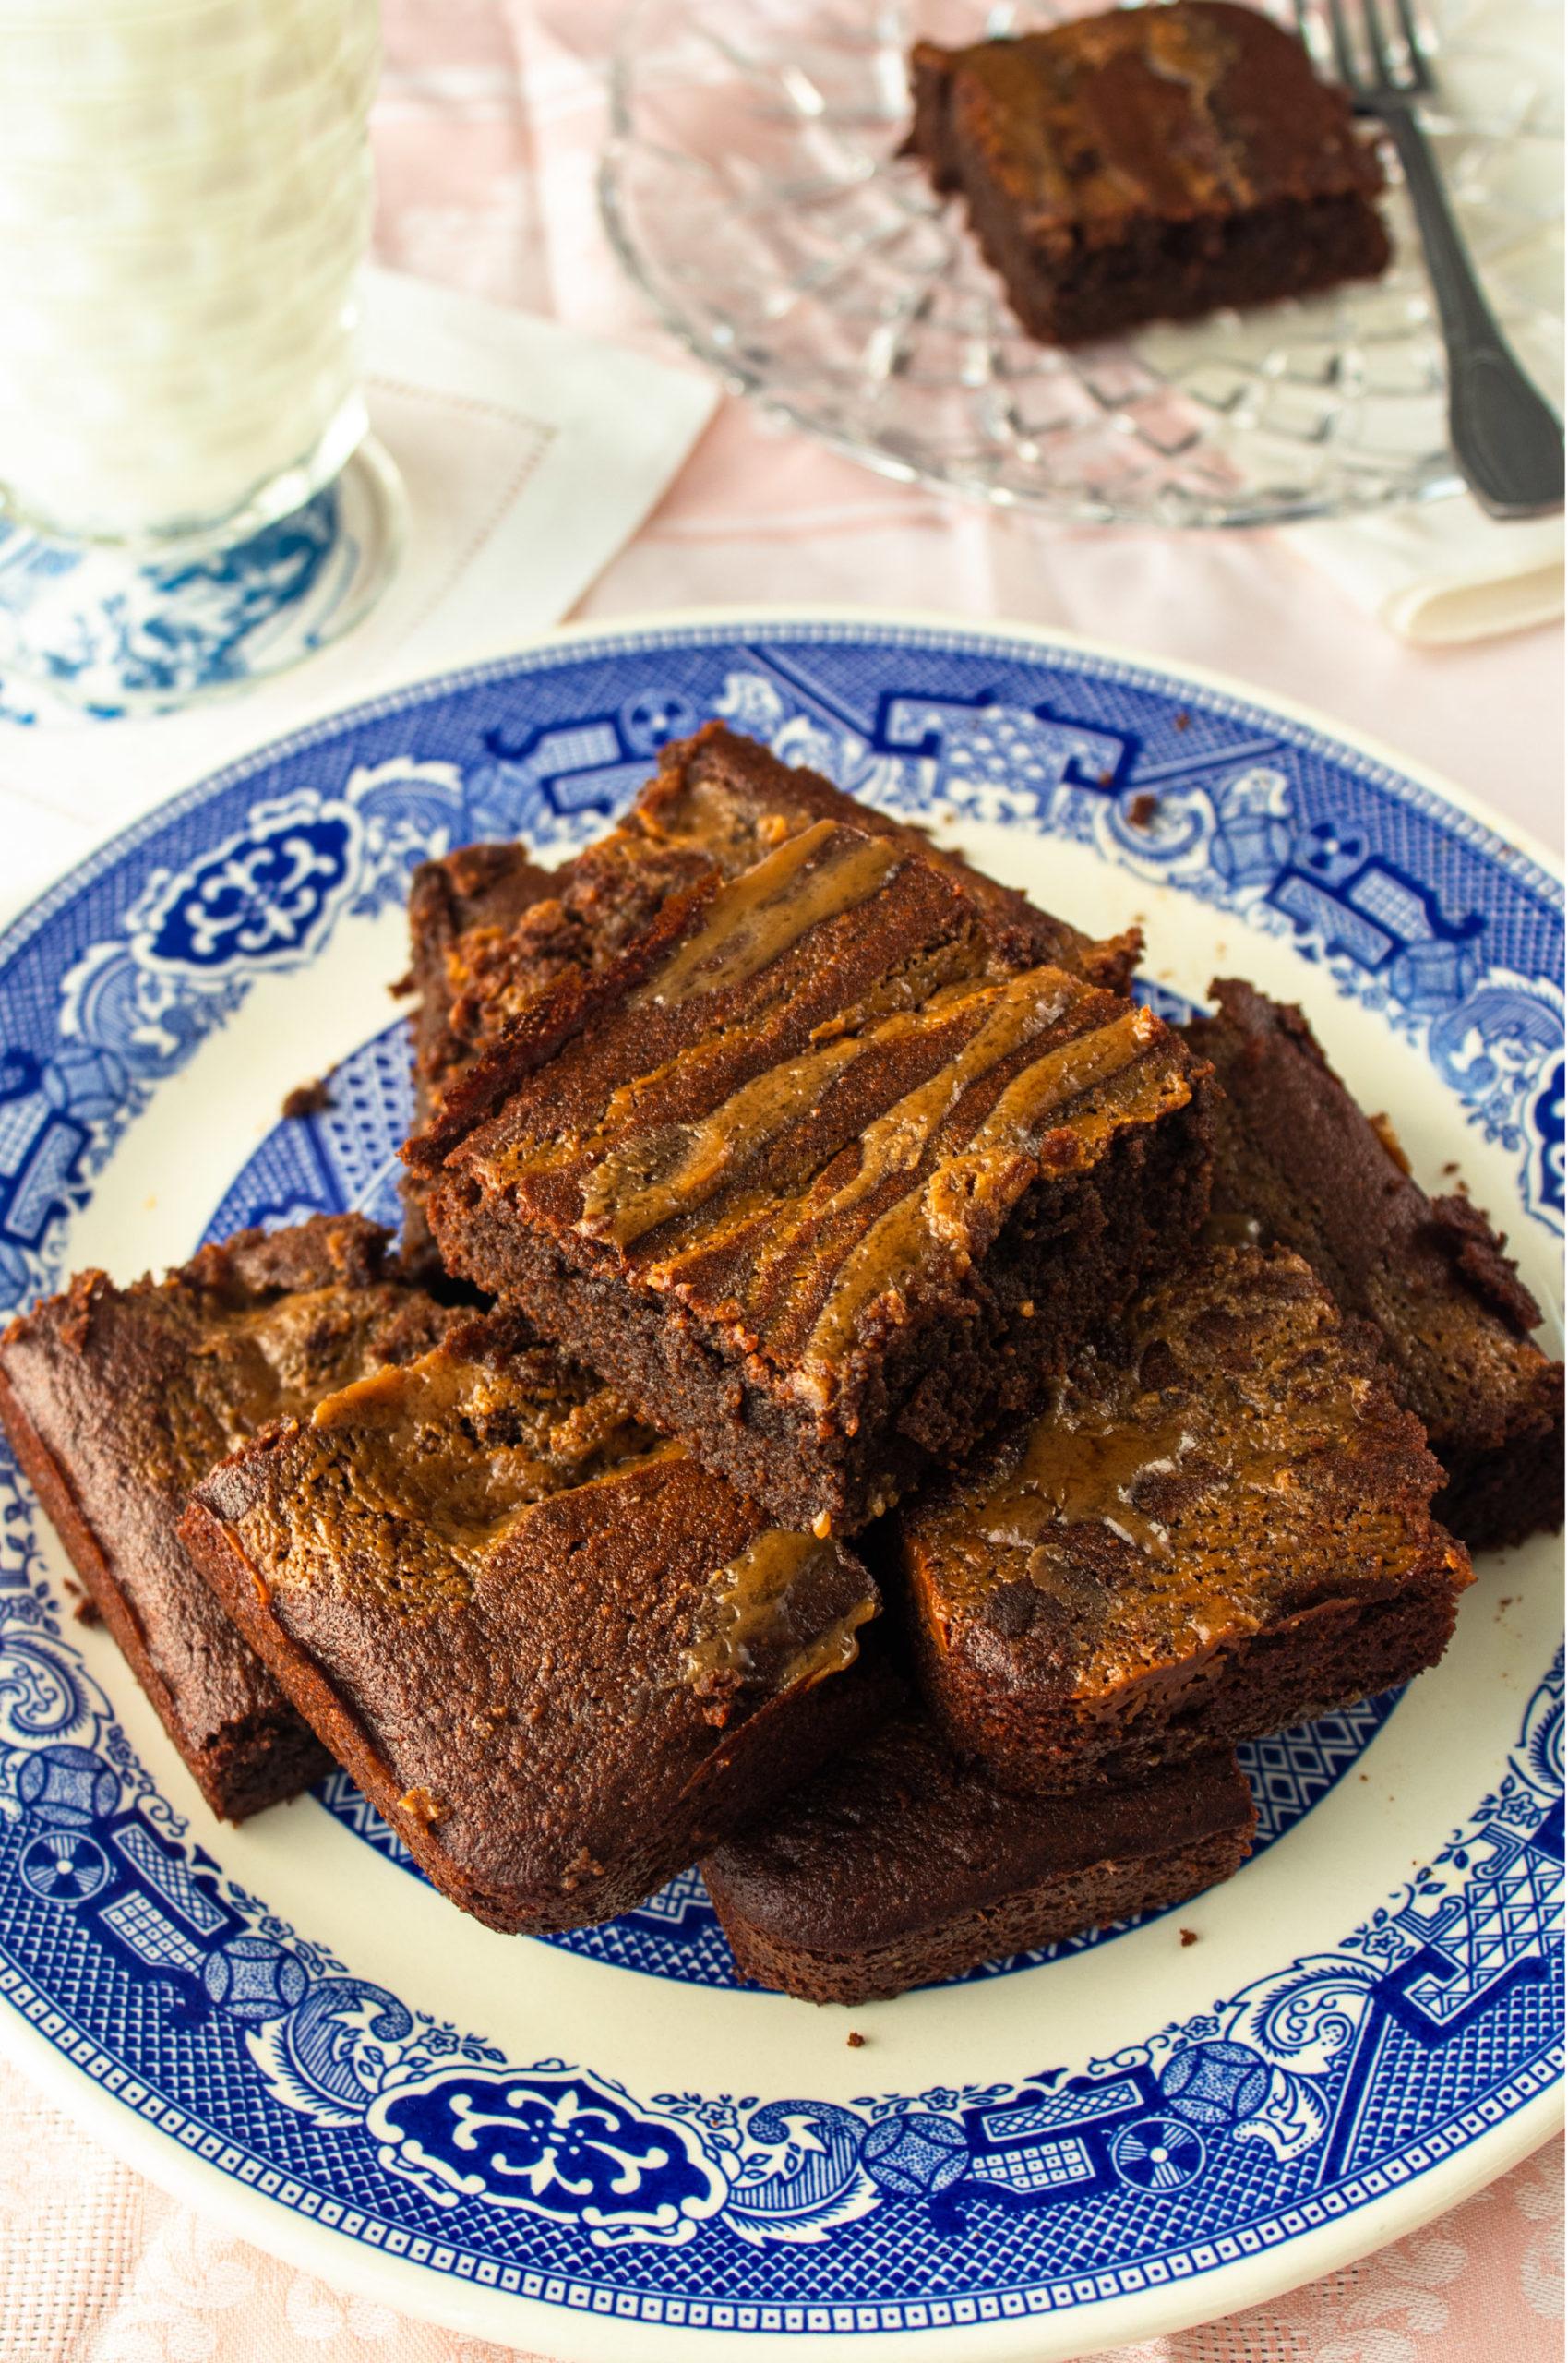 Chocolate caramel gluten free brownies